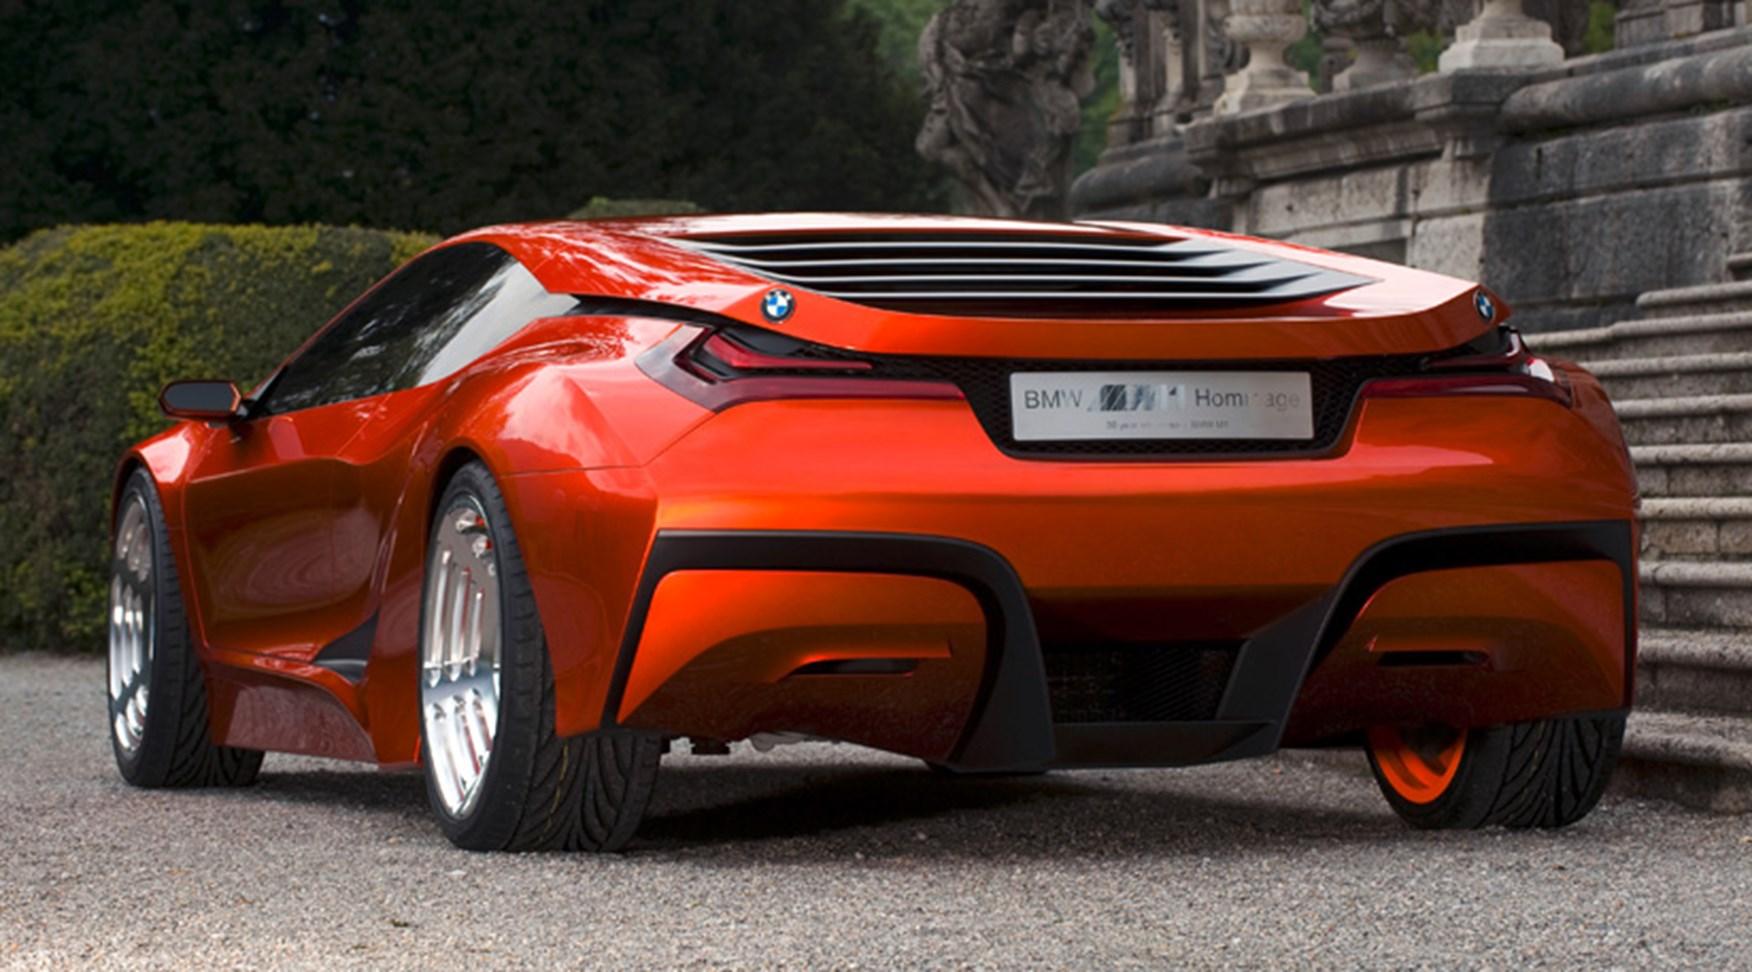 Bmw Plots New M1 Supercar For 2016 Car Magazine